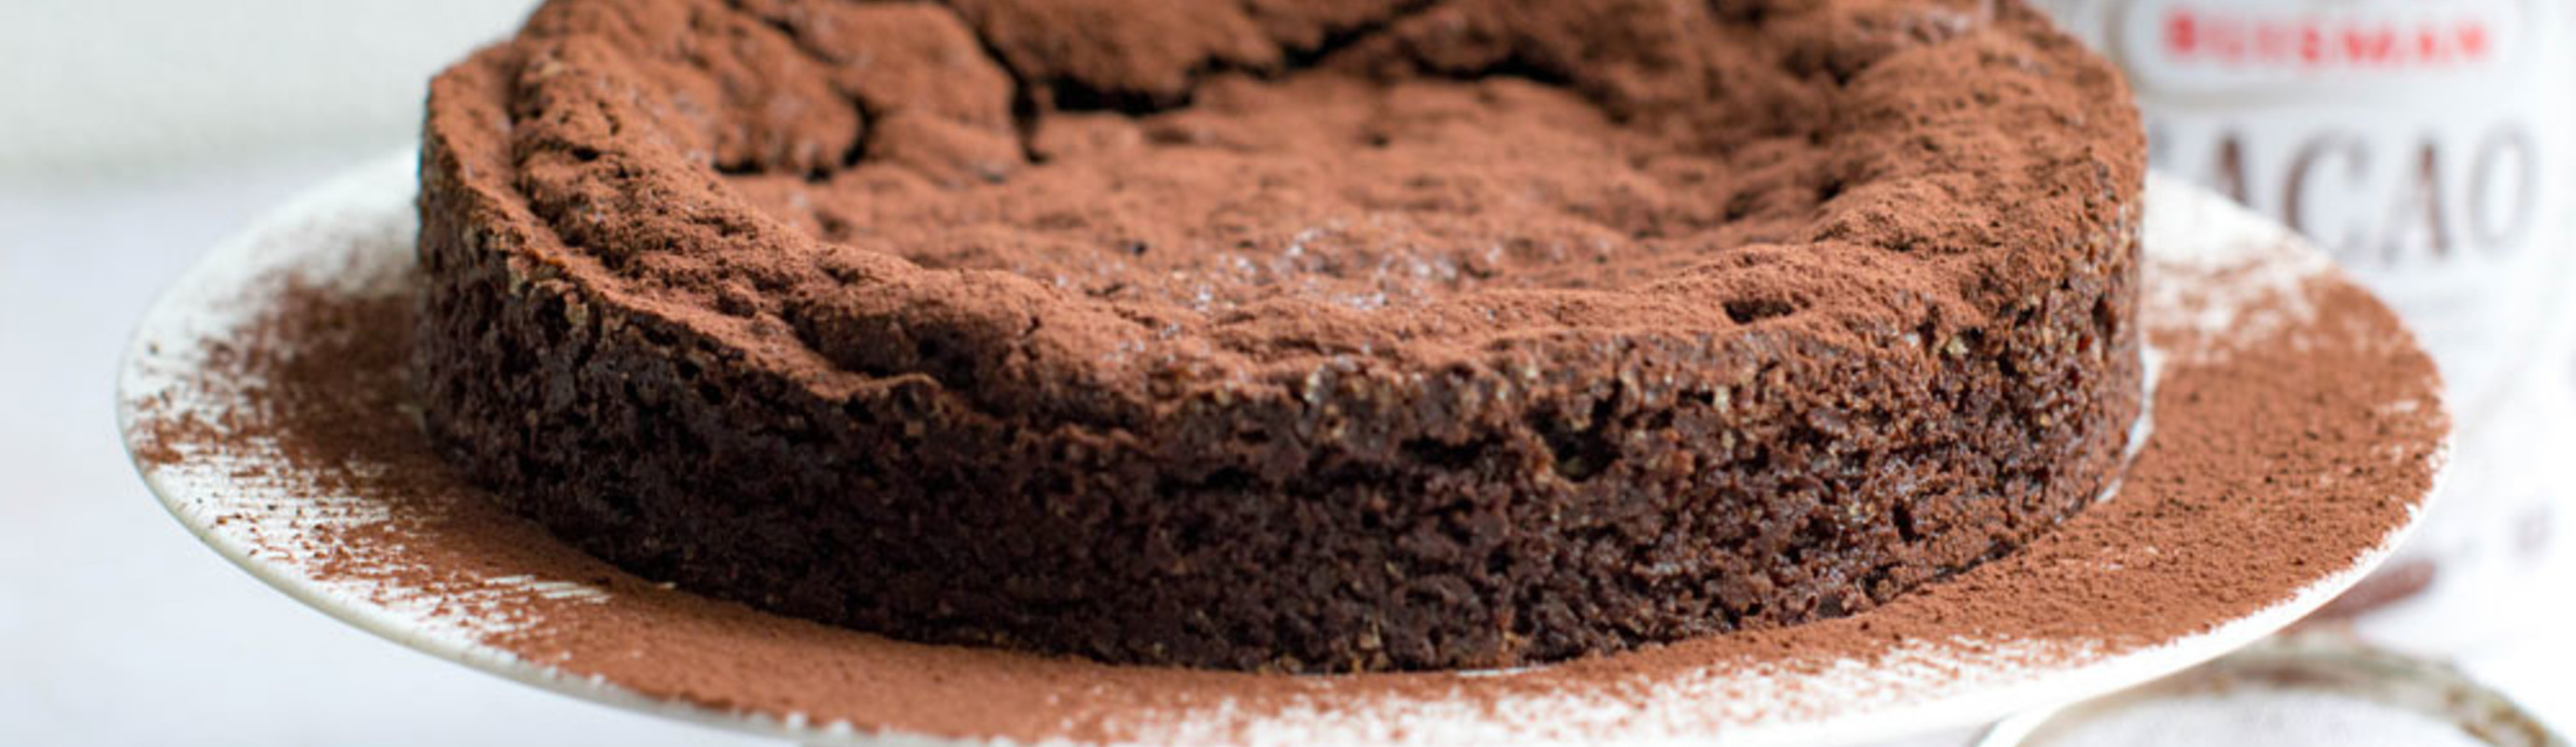 7 november kladdkakans dag - chocolade dag